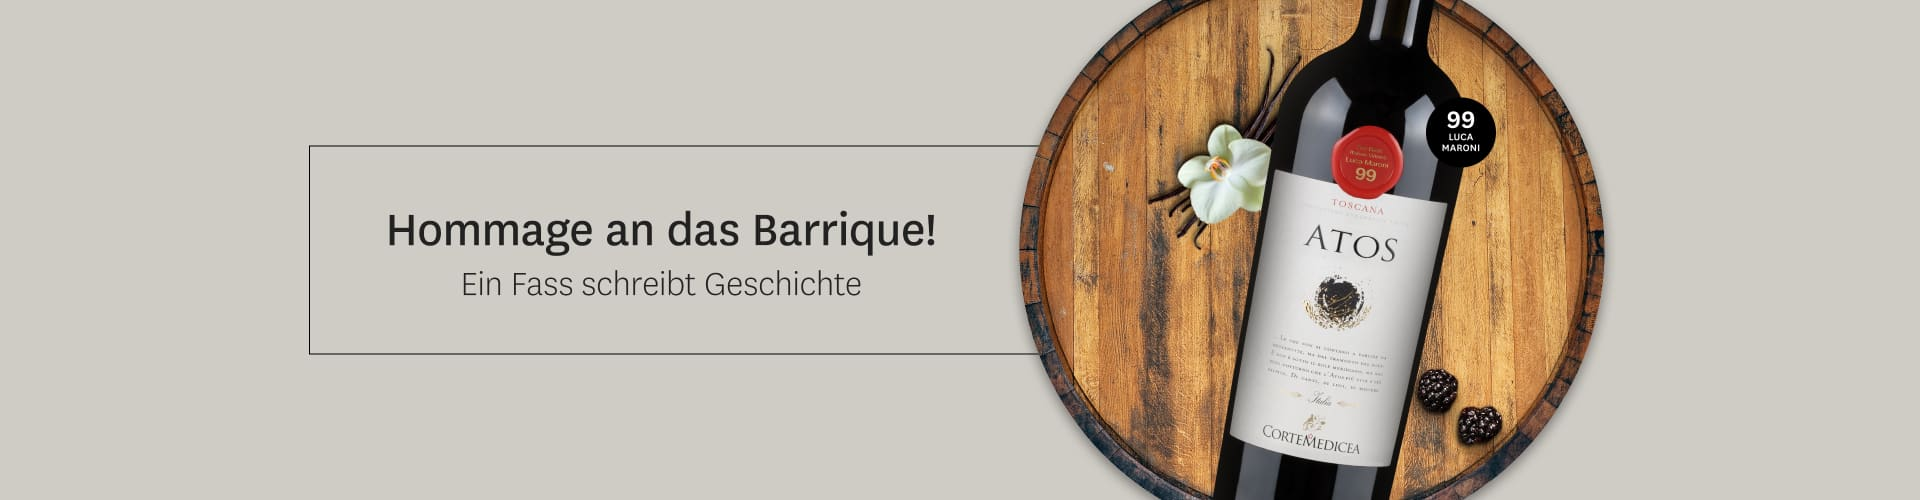 Das grosse Barrique-Special: